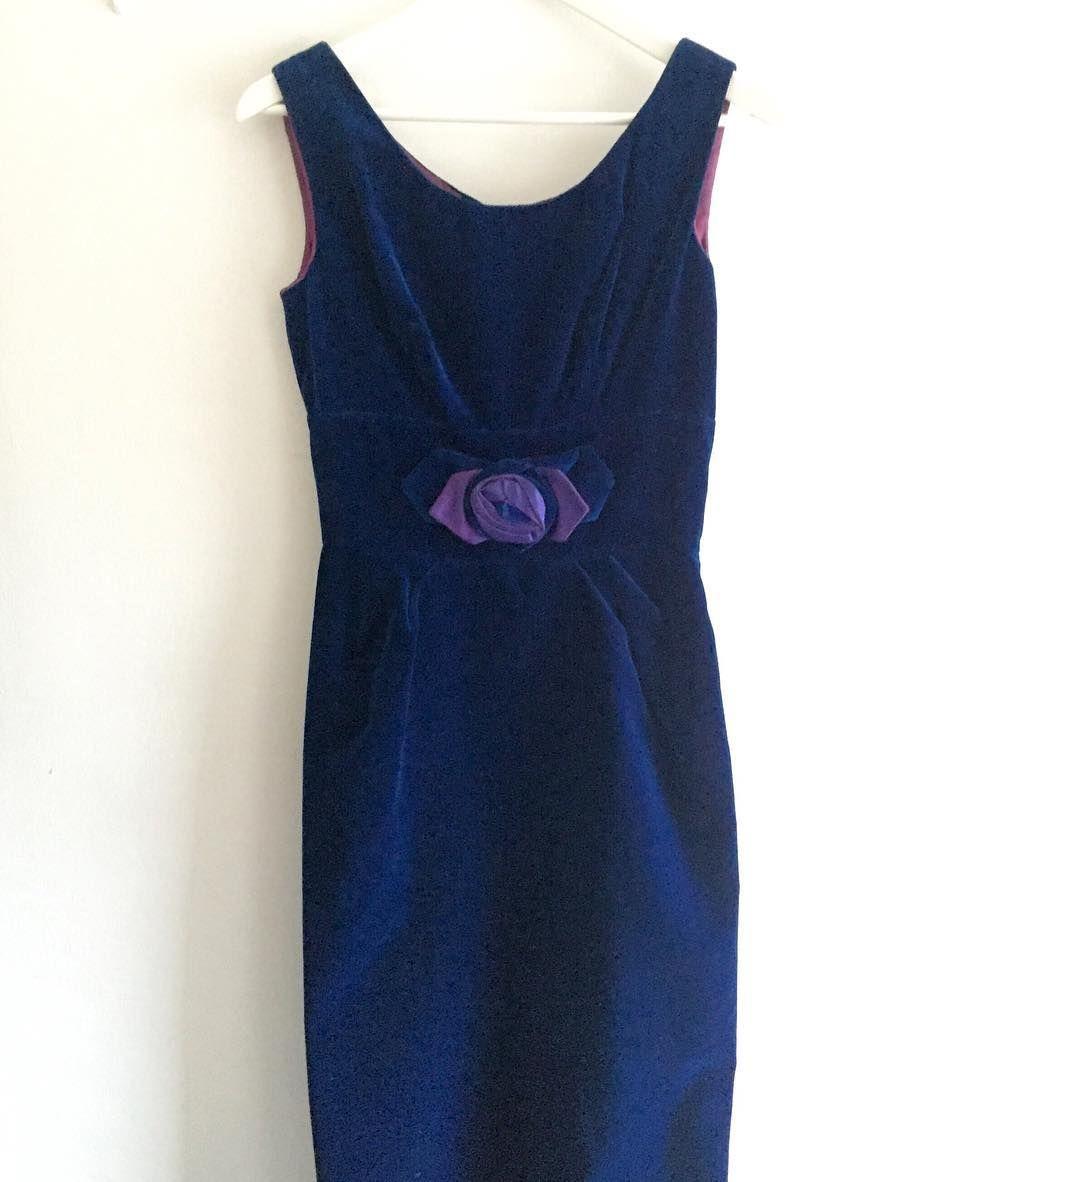 New product roseblue velvet vintage dress#fab.#vintagefashion #1950s #1960s #ヴィンテージ #ビンテージ #ヴィンテージファッション #ヴィンテージワンピース #ヴィンテージドレス #古着 #ベルベット